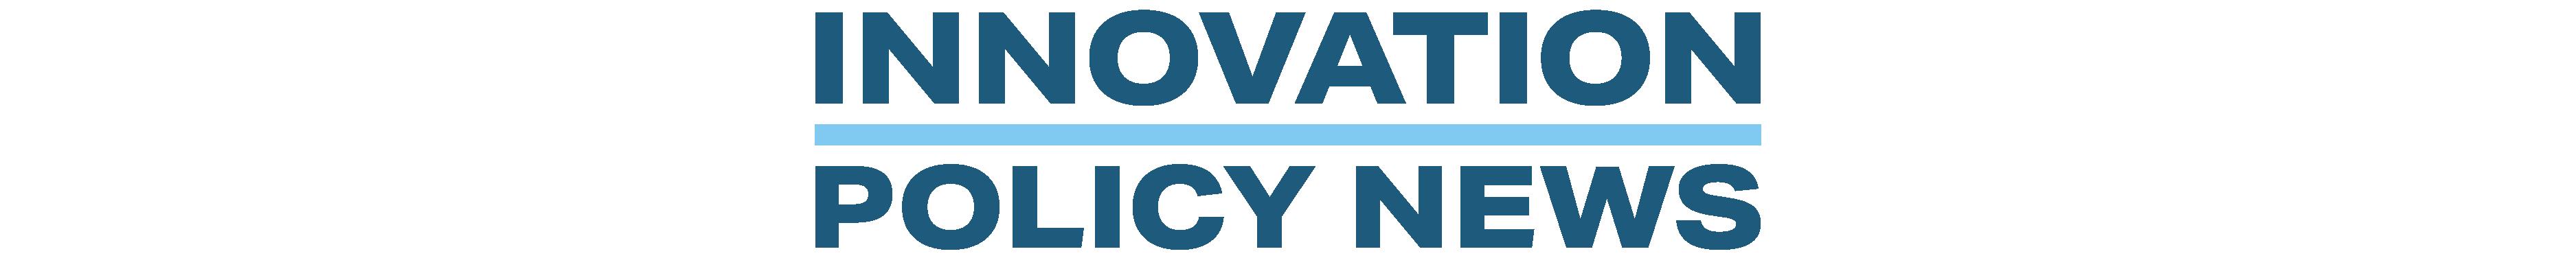 Innovation Policy News